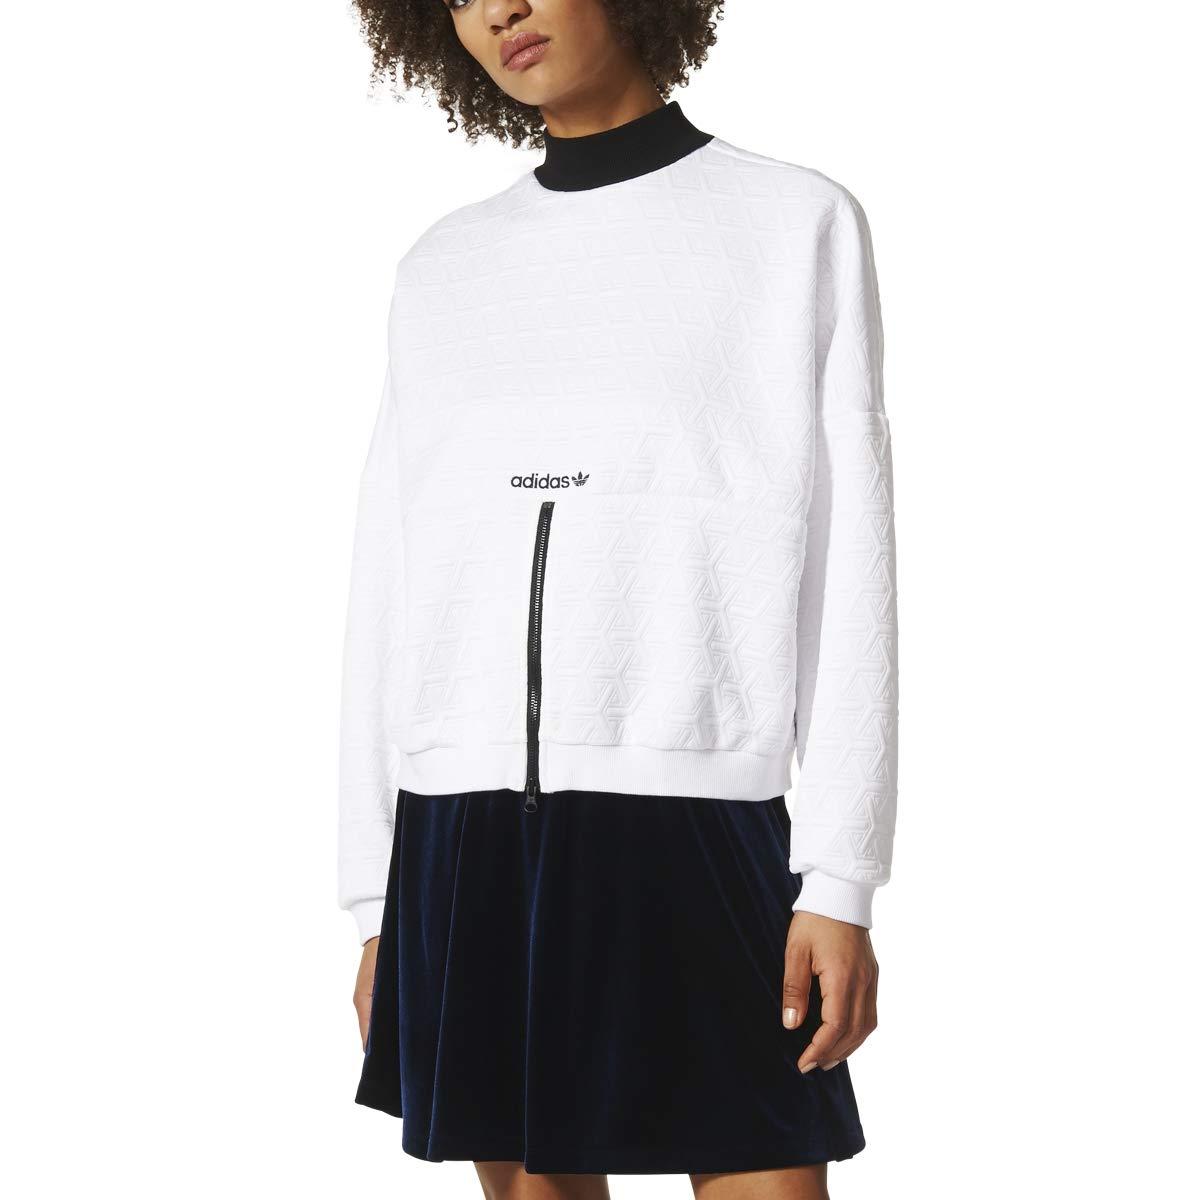 Adidas Zip Through Sweatshirt Womens Style: BR0295-WHITE Size: XS